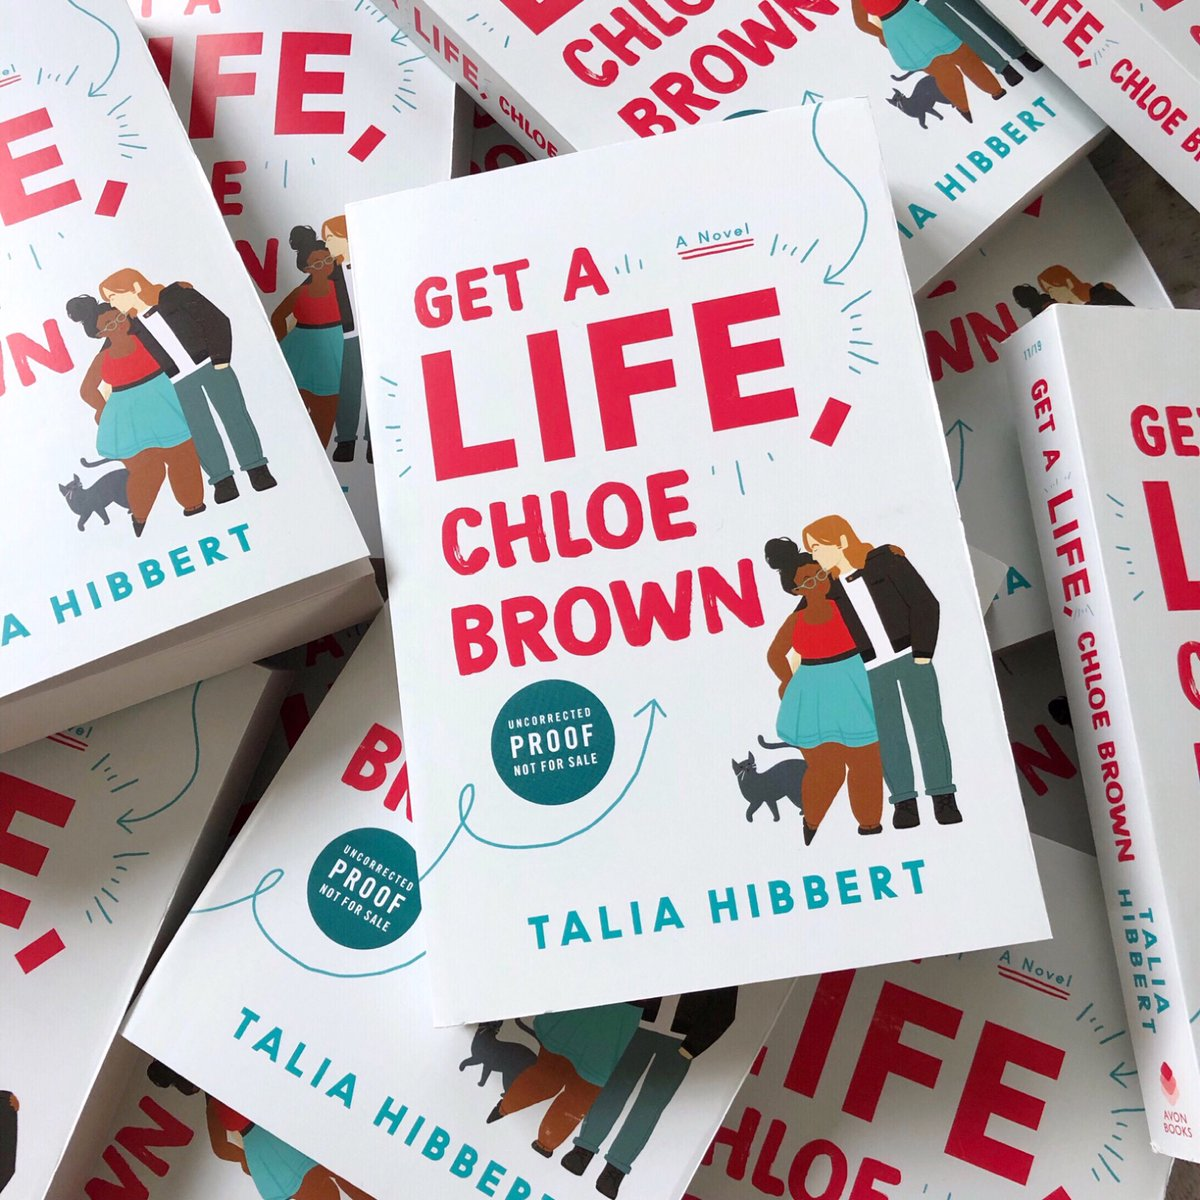 Get a Life, Chloe Brown by Talia Hibbert.